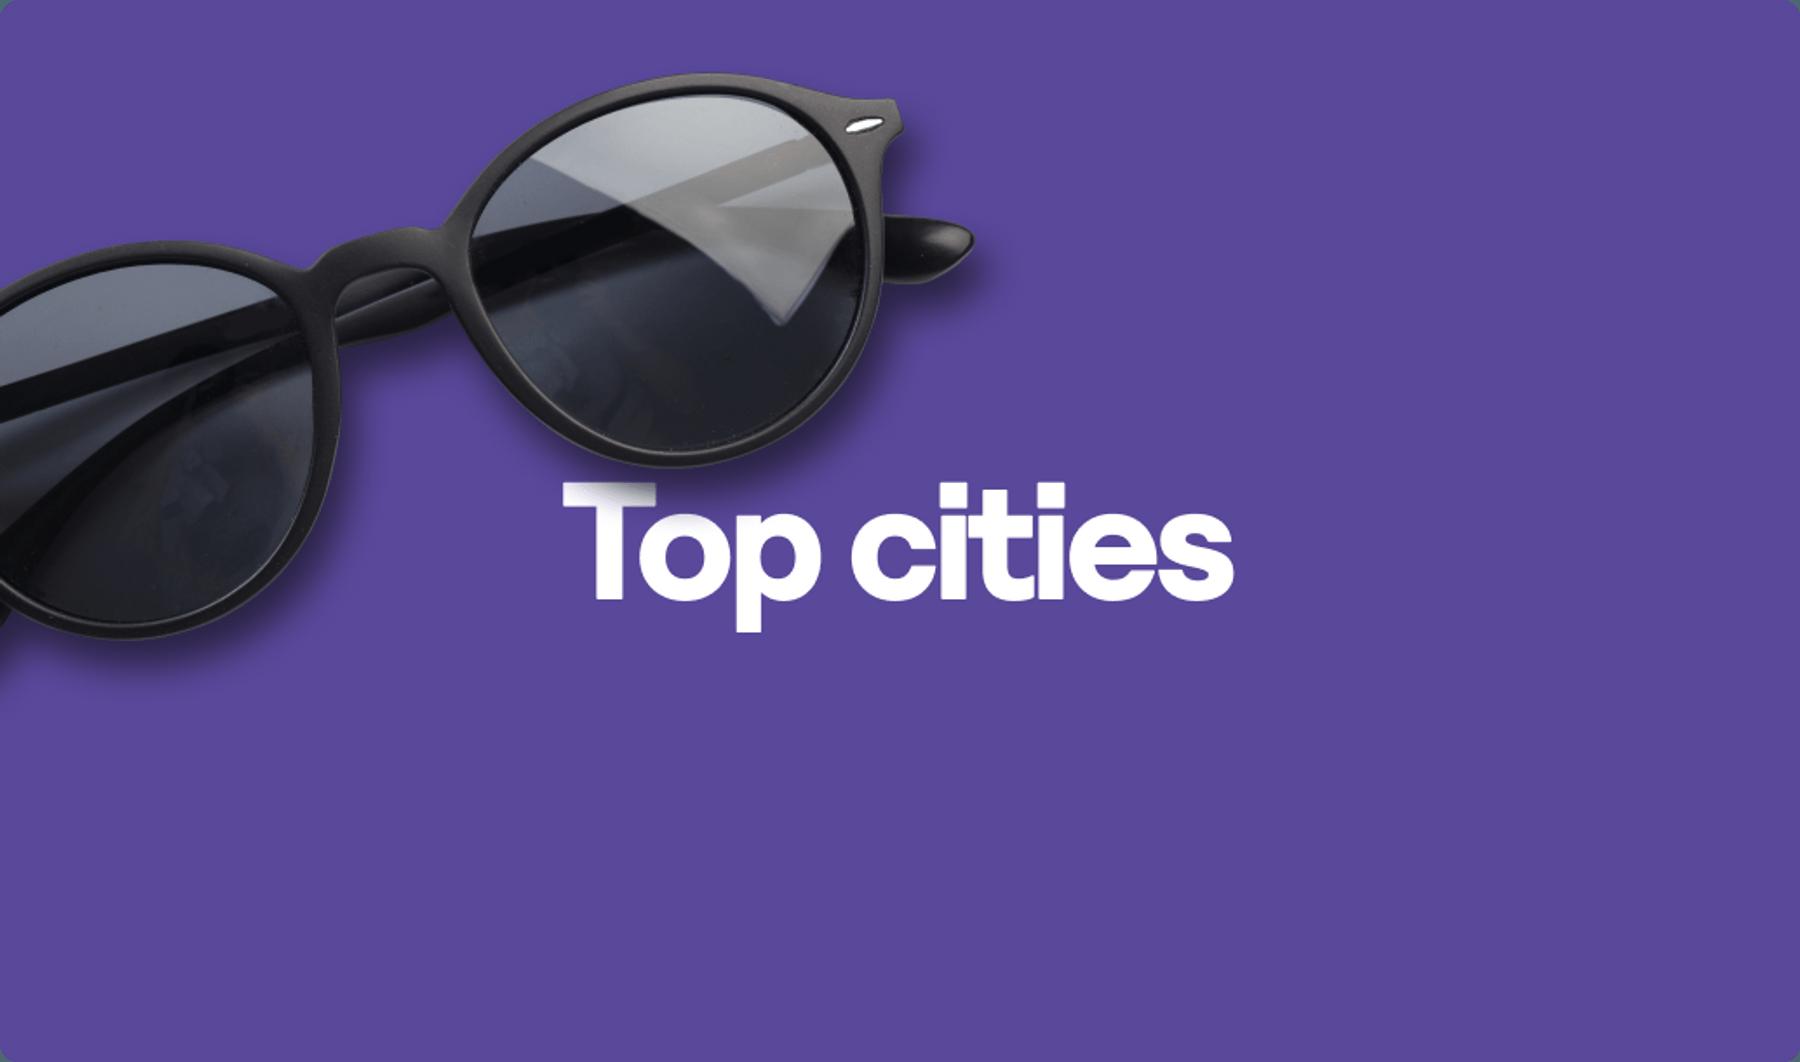 Top cities graphic